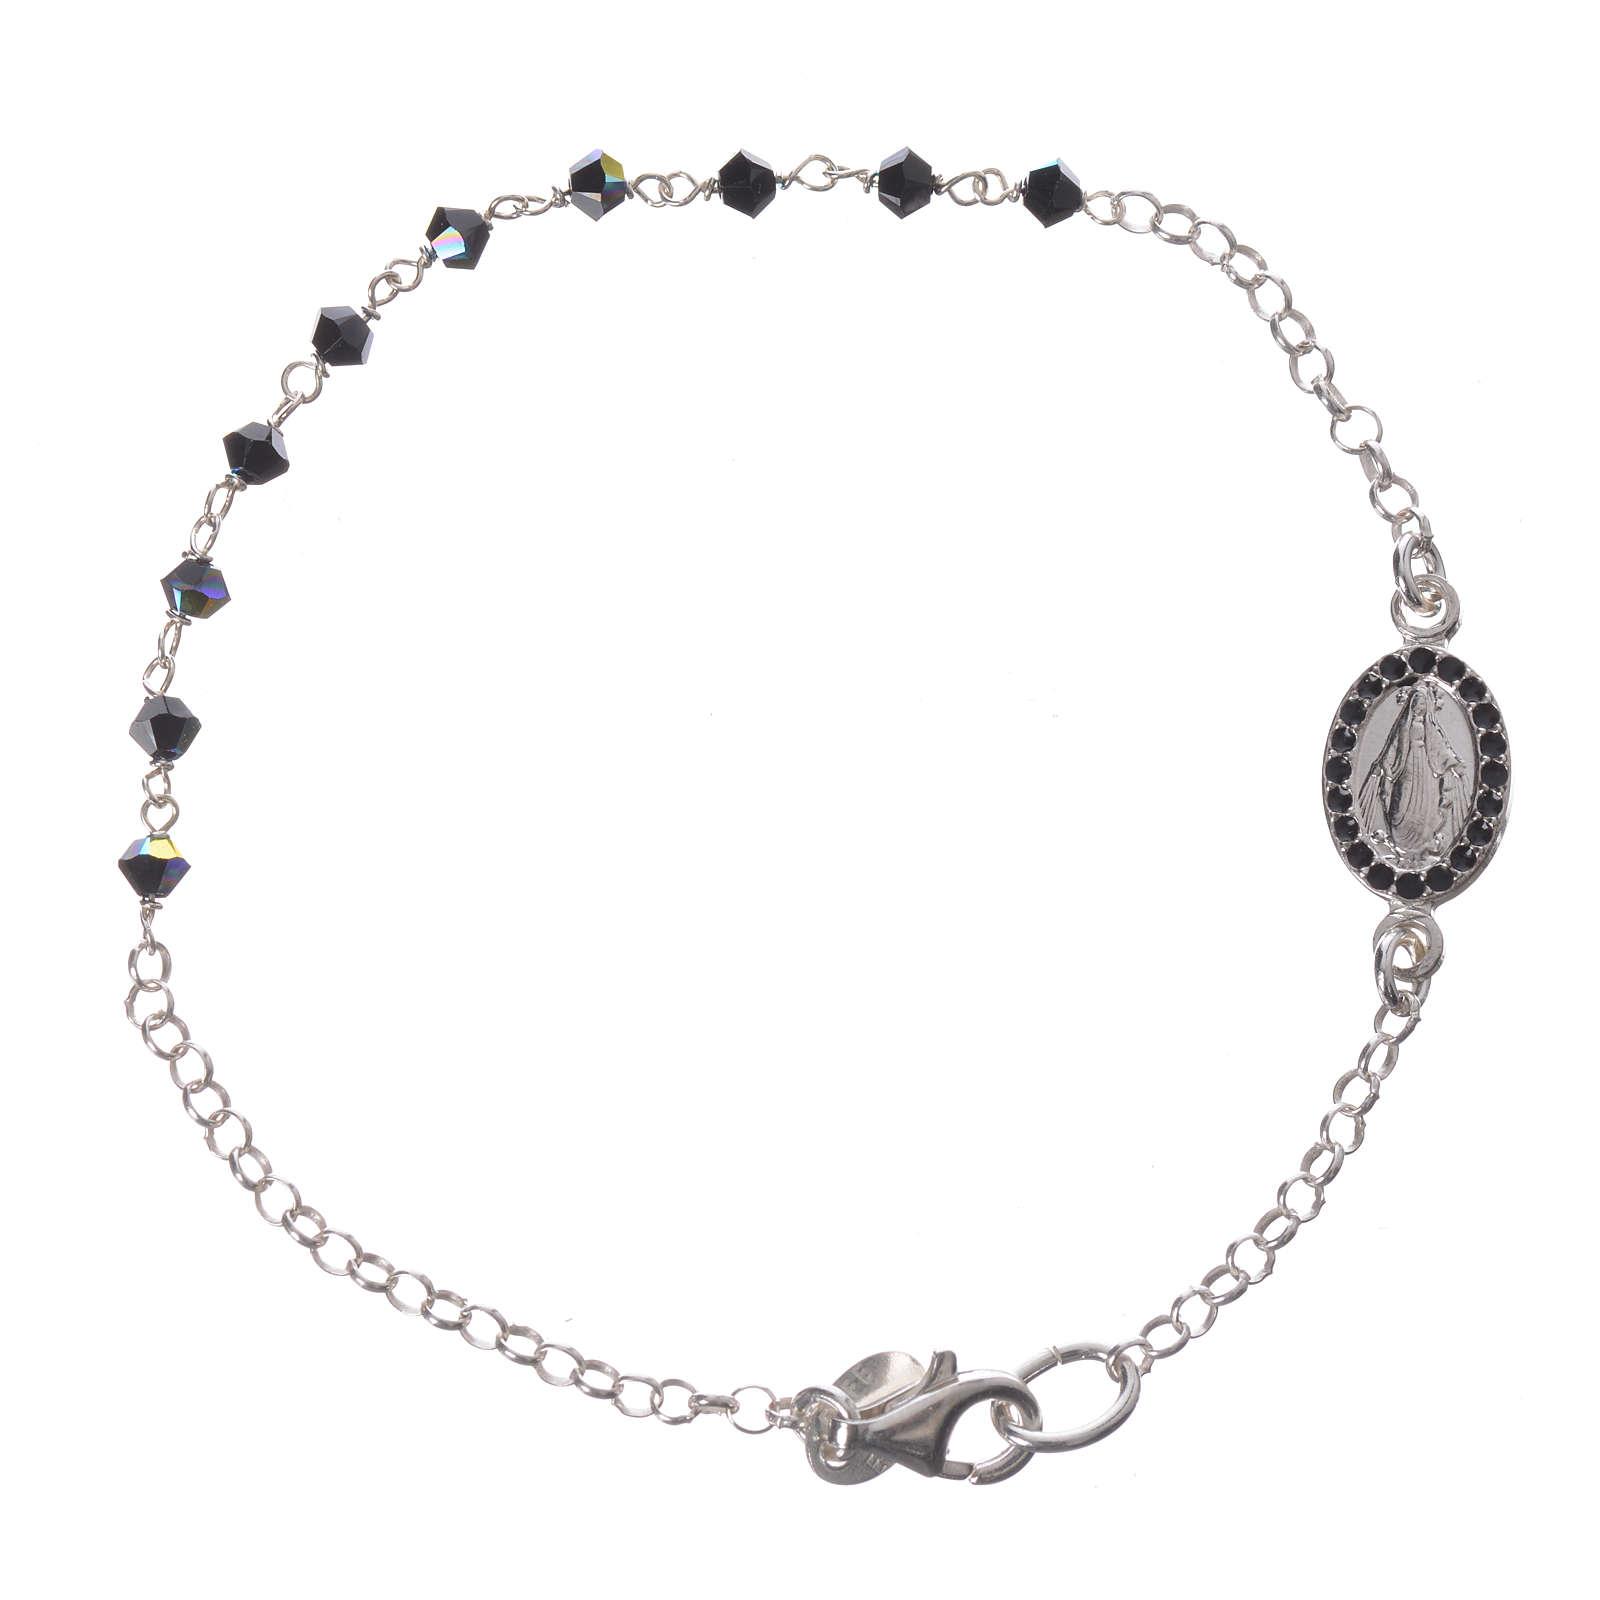 Bracelet Single Decade silver 800 Swarovski black 3mm 4